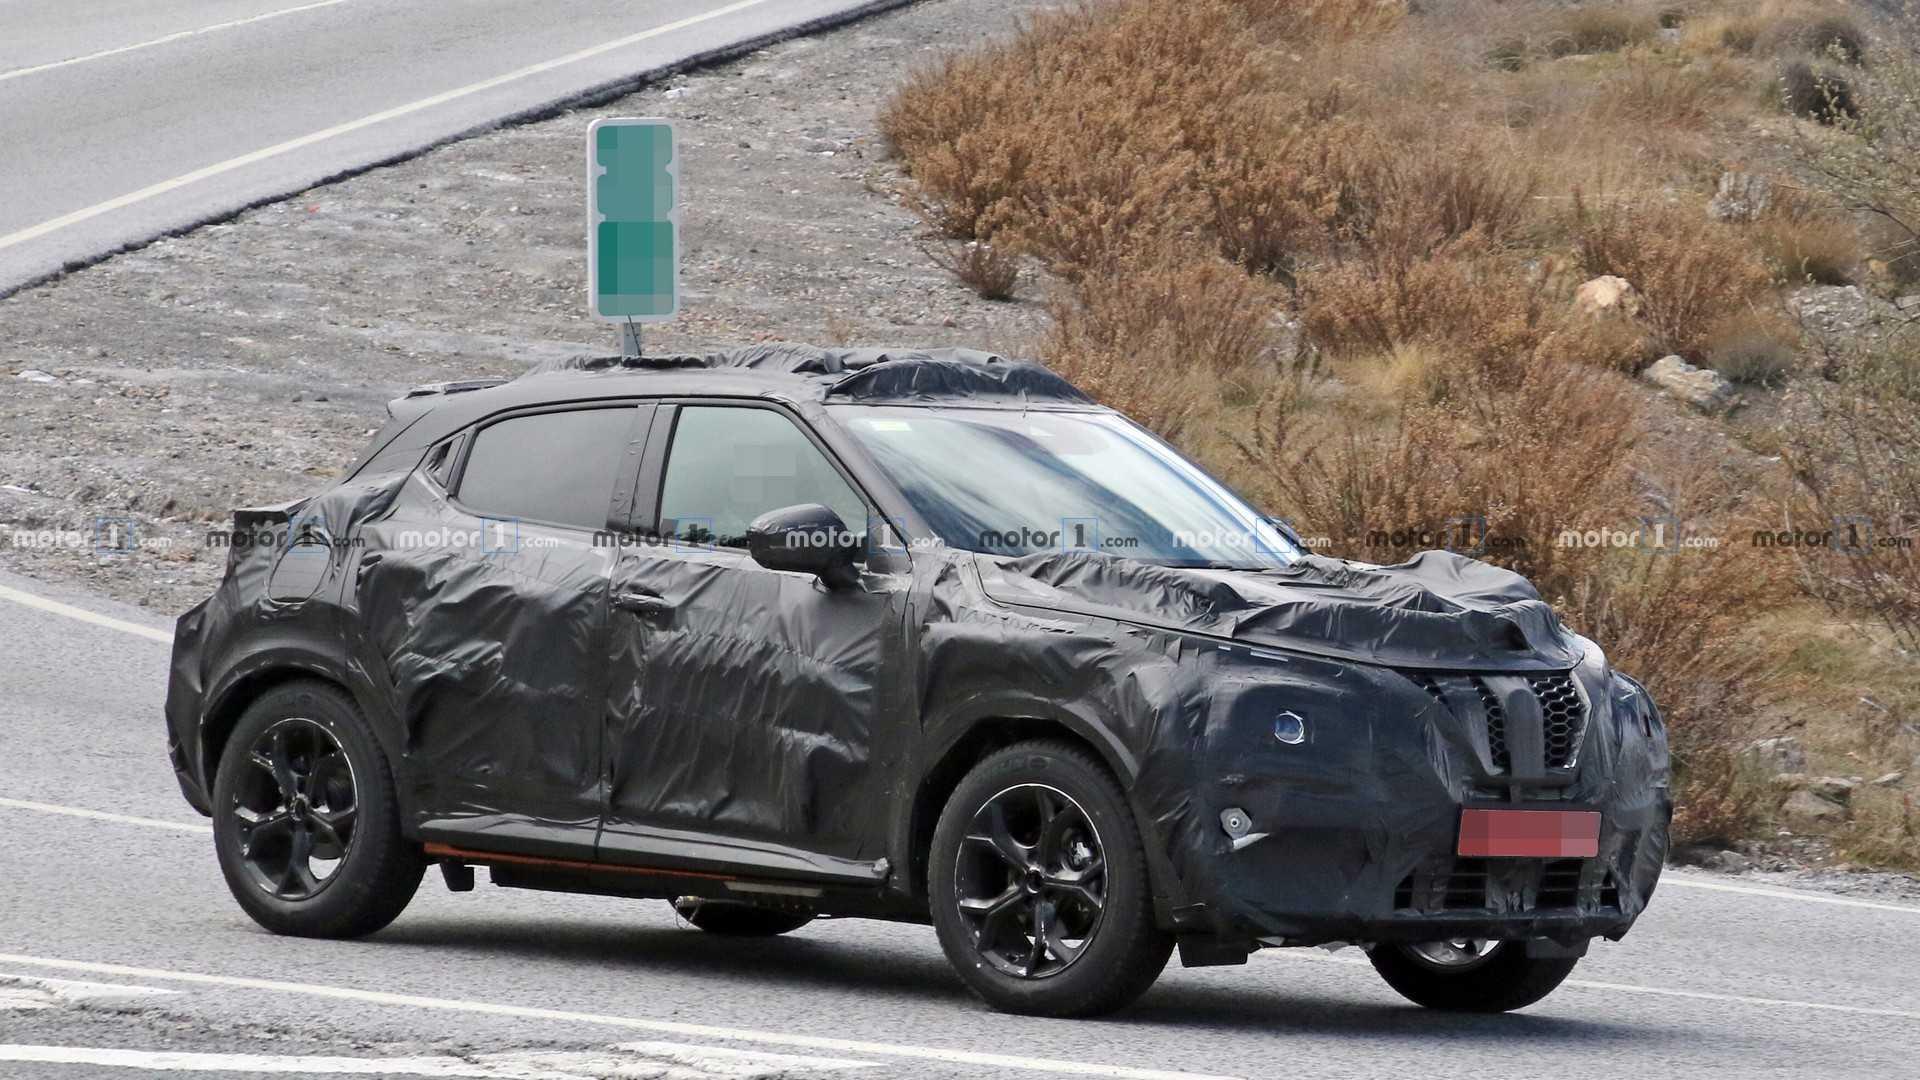 59 New Nissan Juke 2020 Spy Shots Redesign with Nissan Juke 2020 Spy Shots